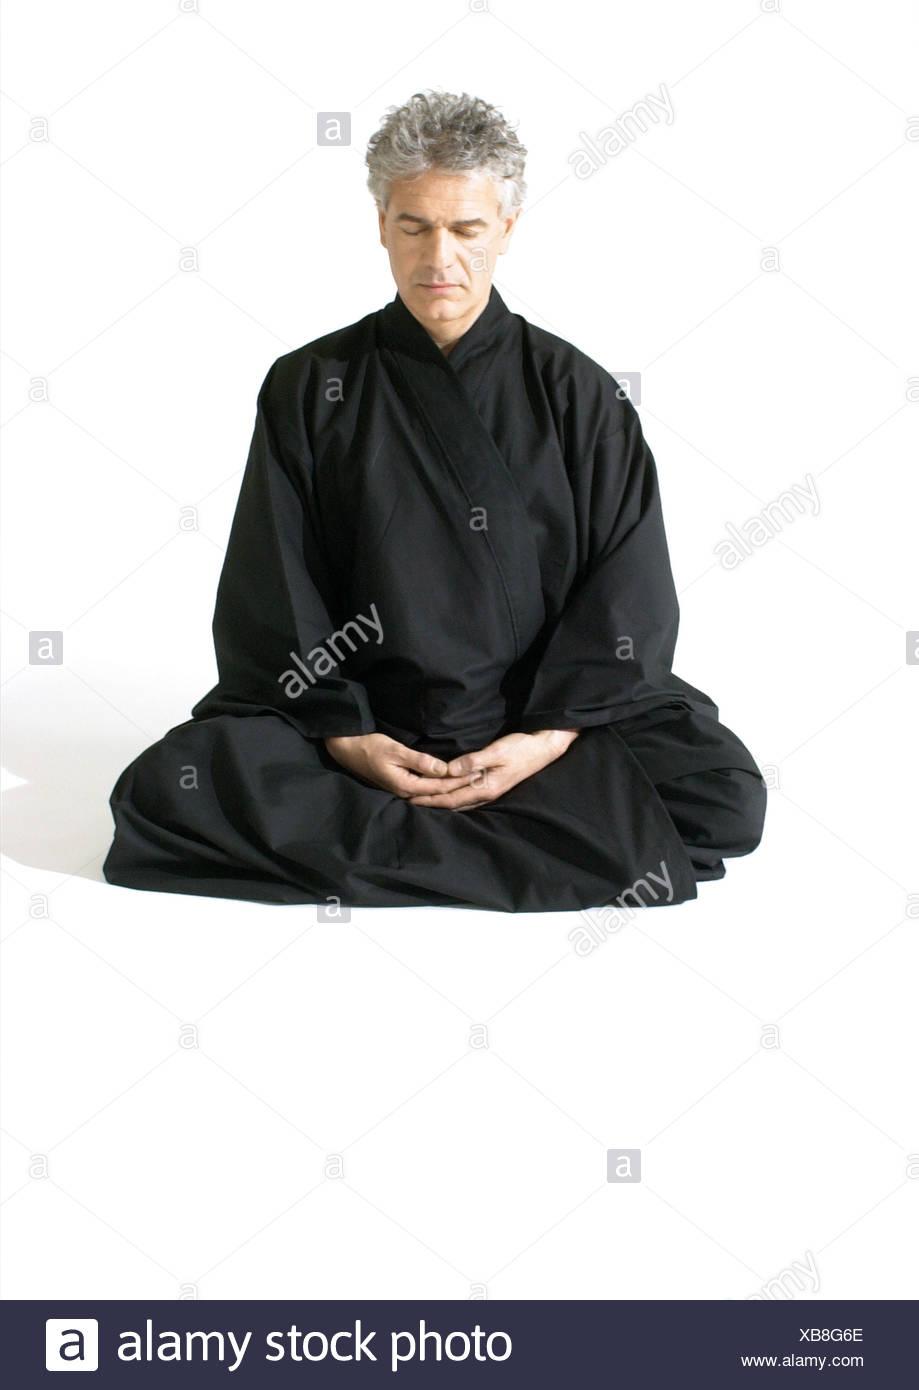 Man sitting on floor, meditating - Stock Image